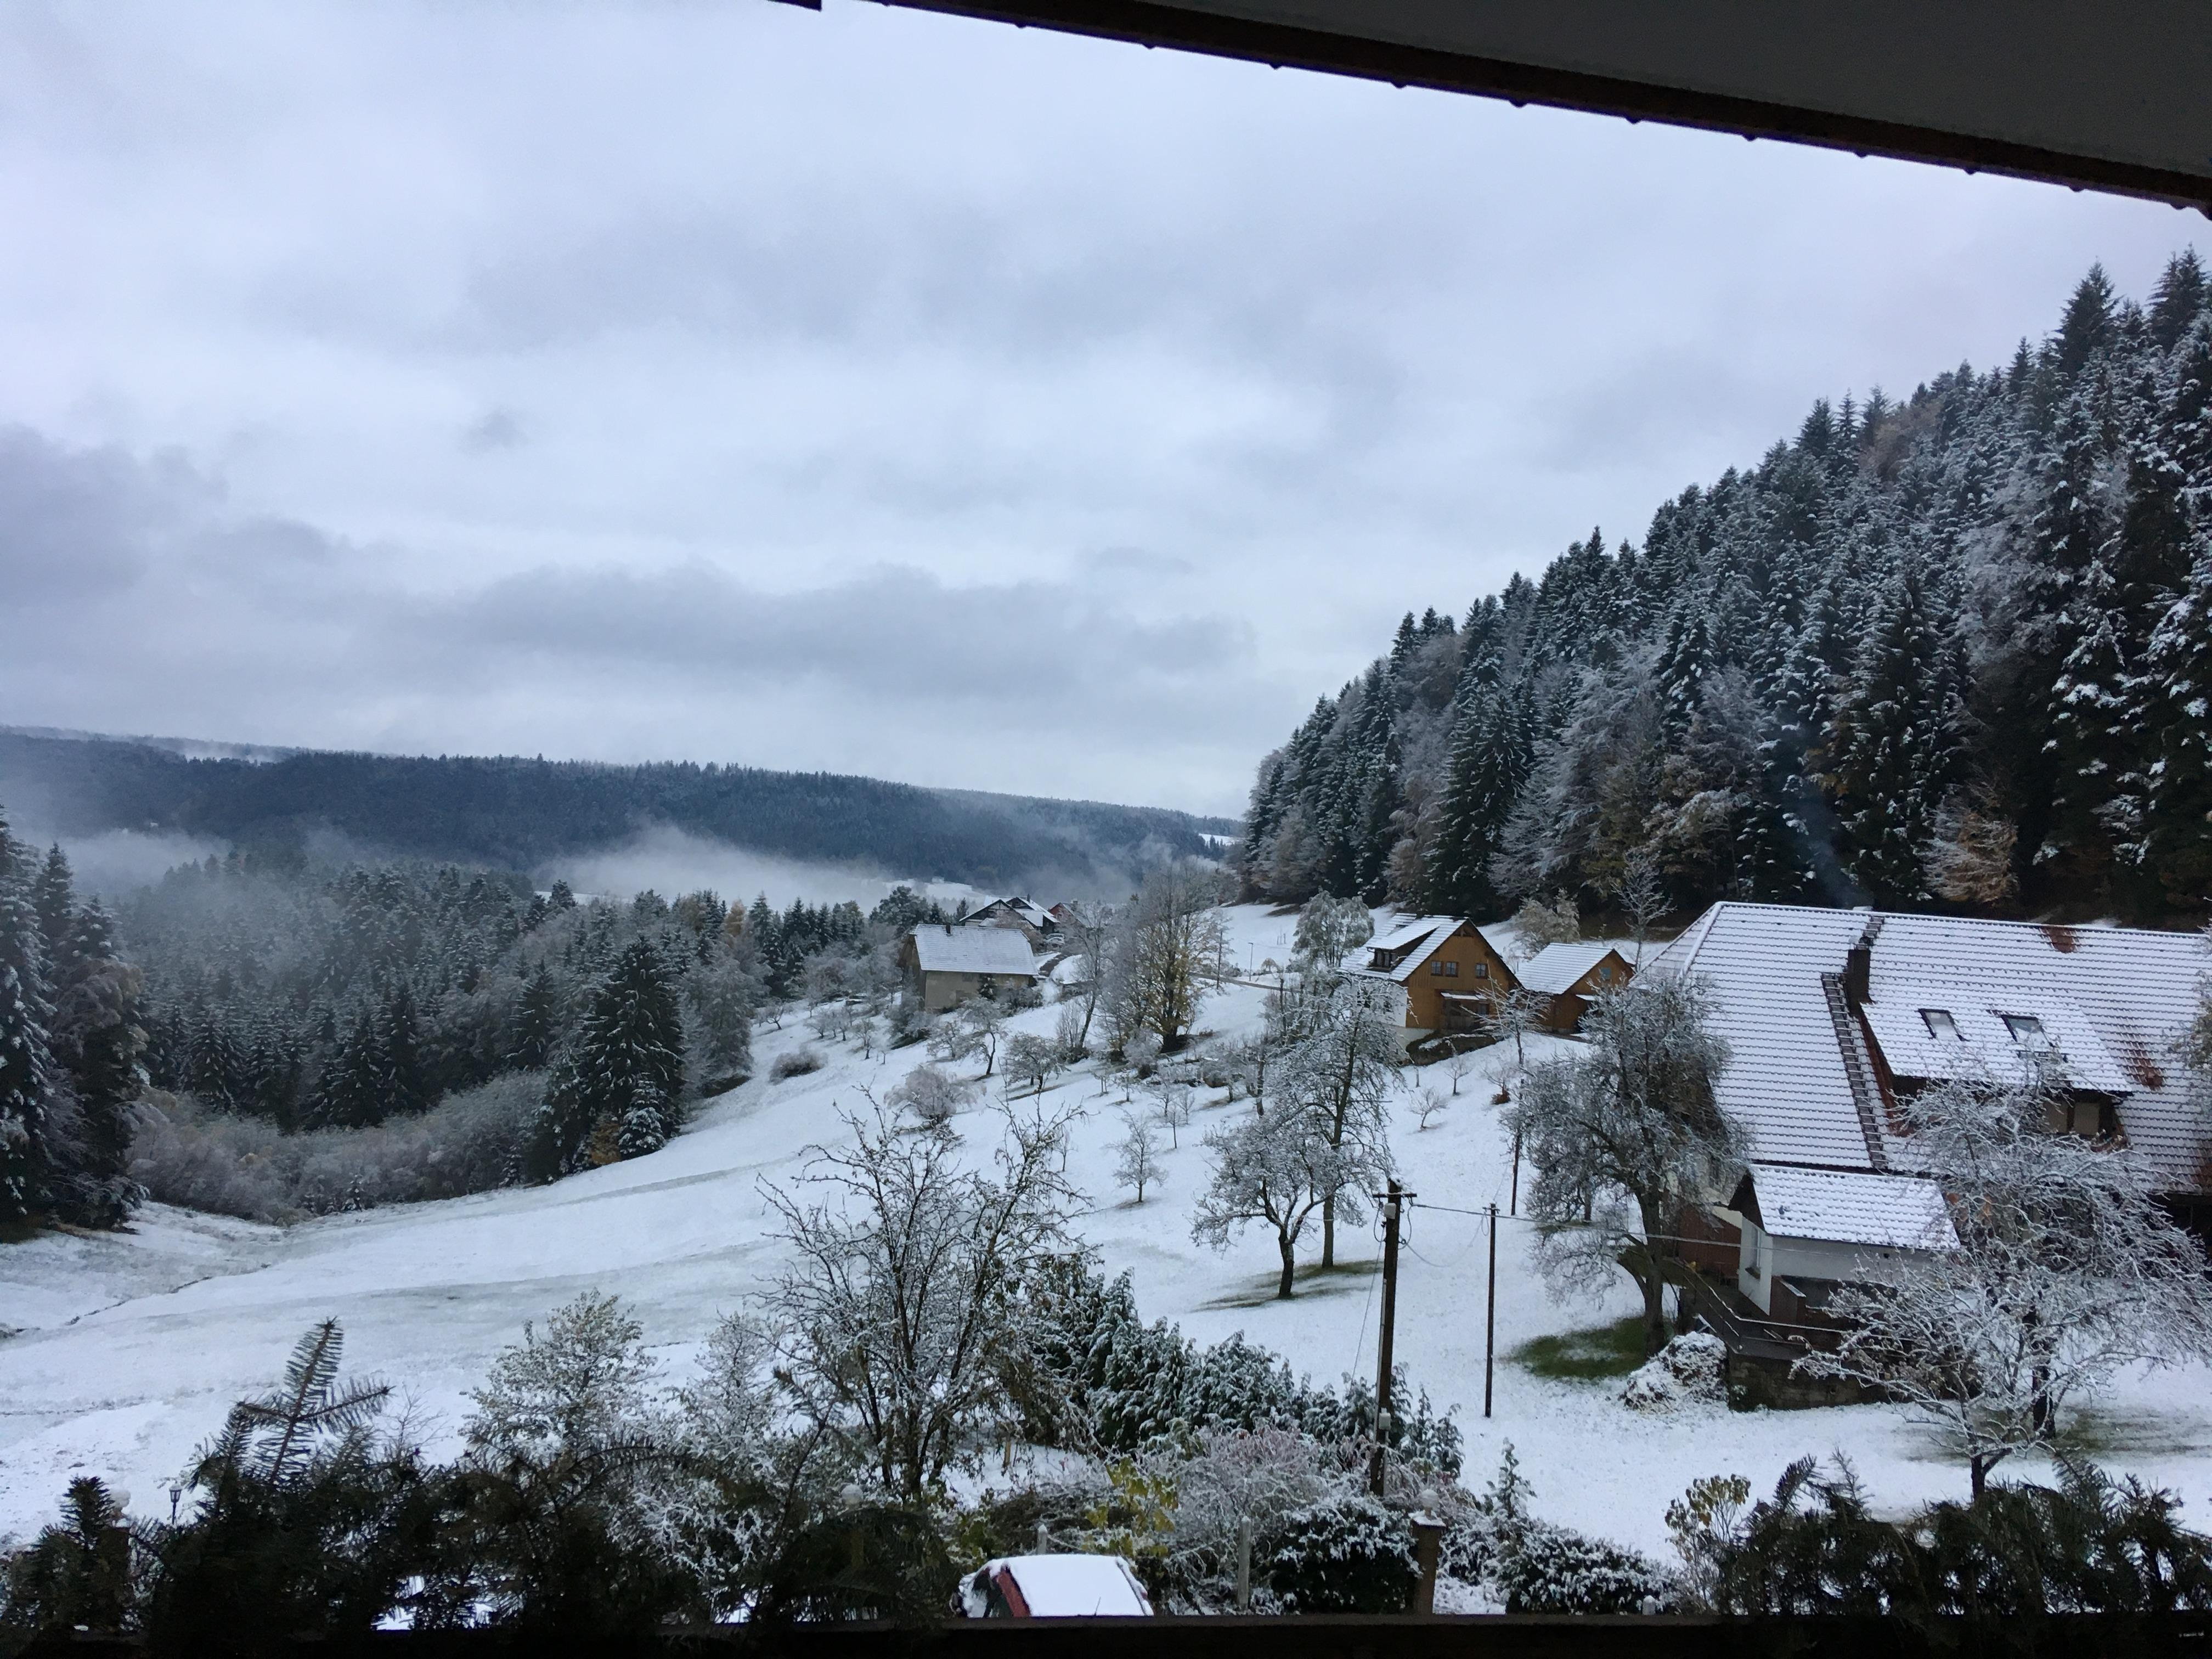 6.Nov.2017 Blick aus dem Fenster